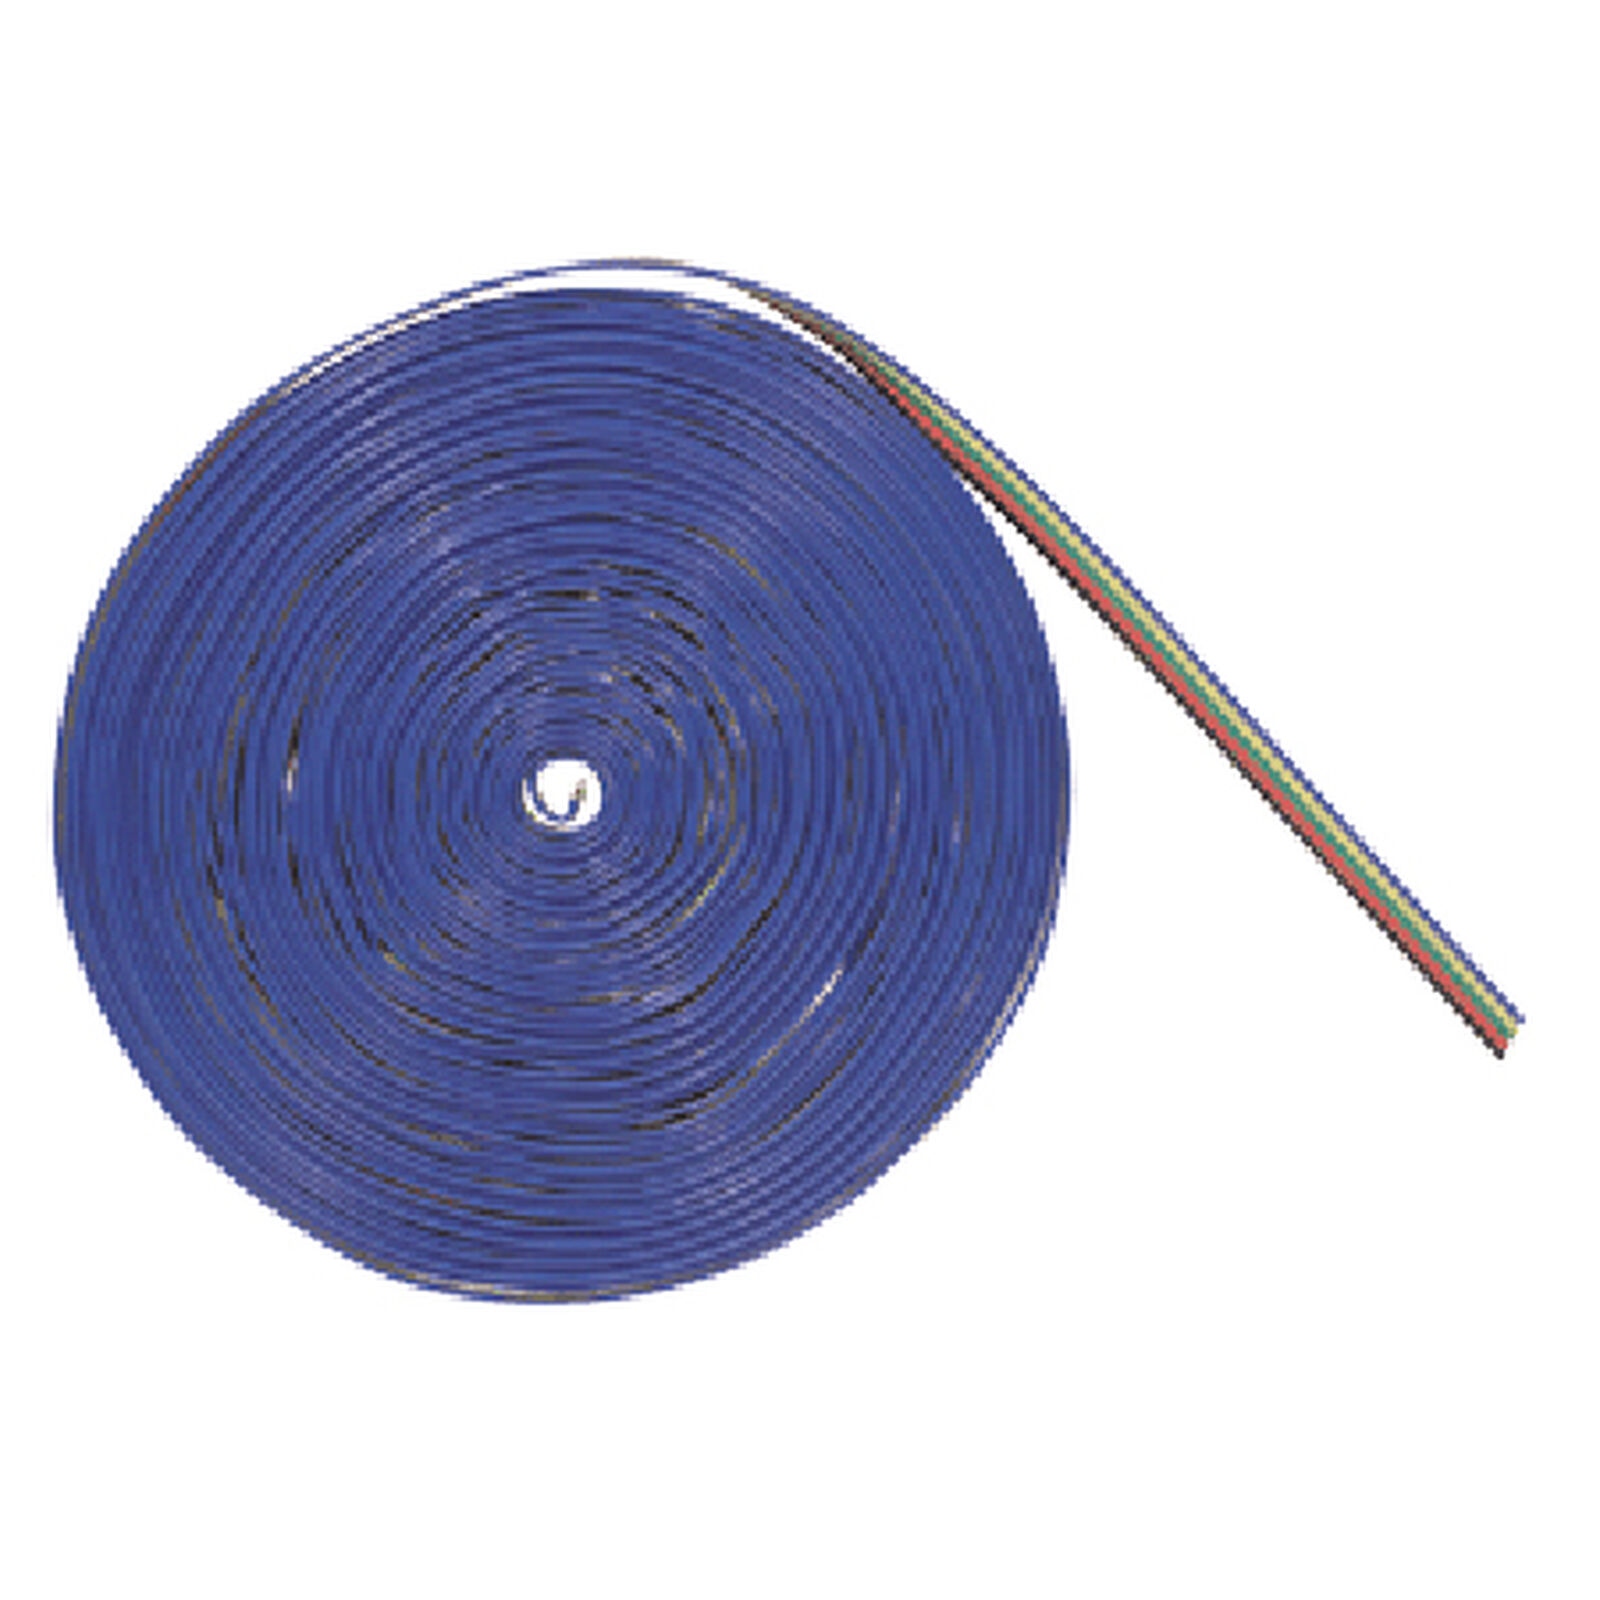 50' Ribbon Wire, 5 Conductor